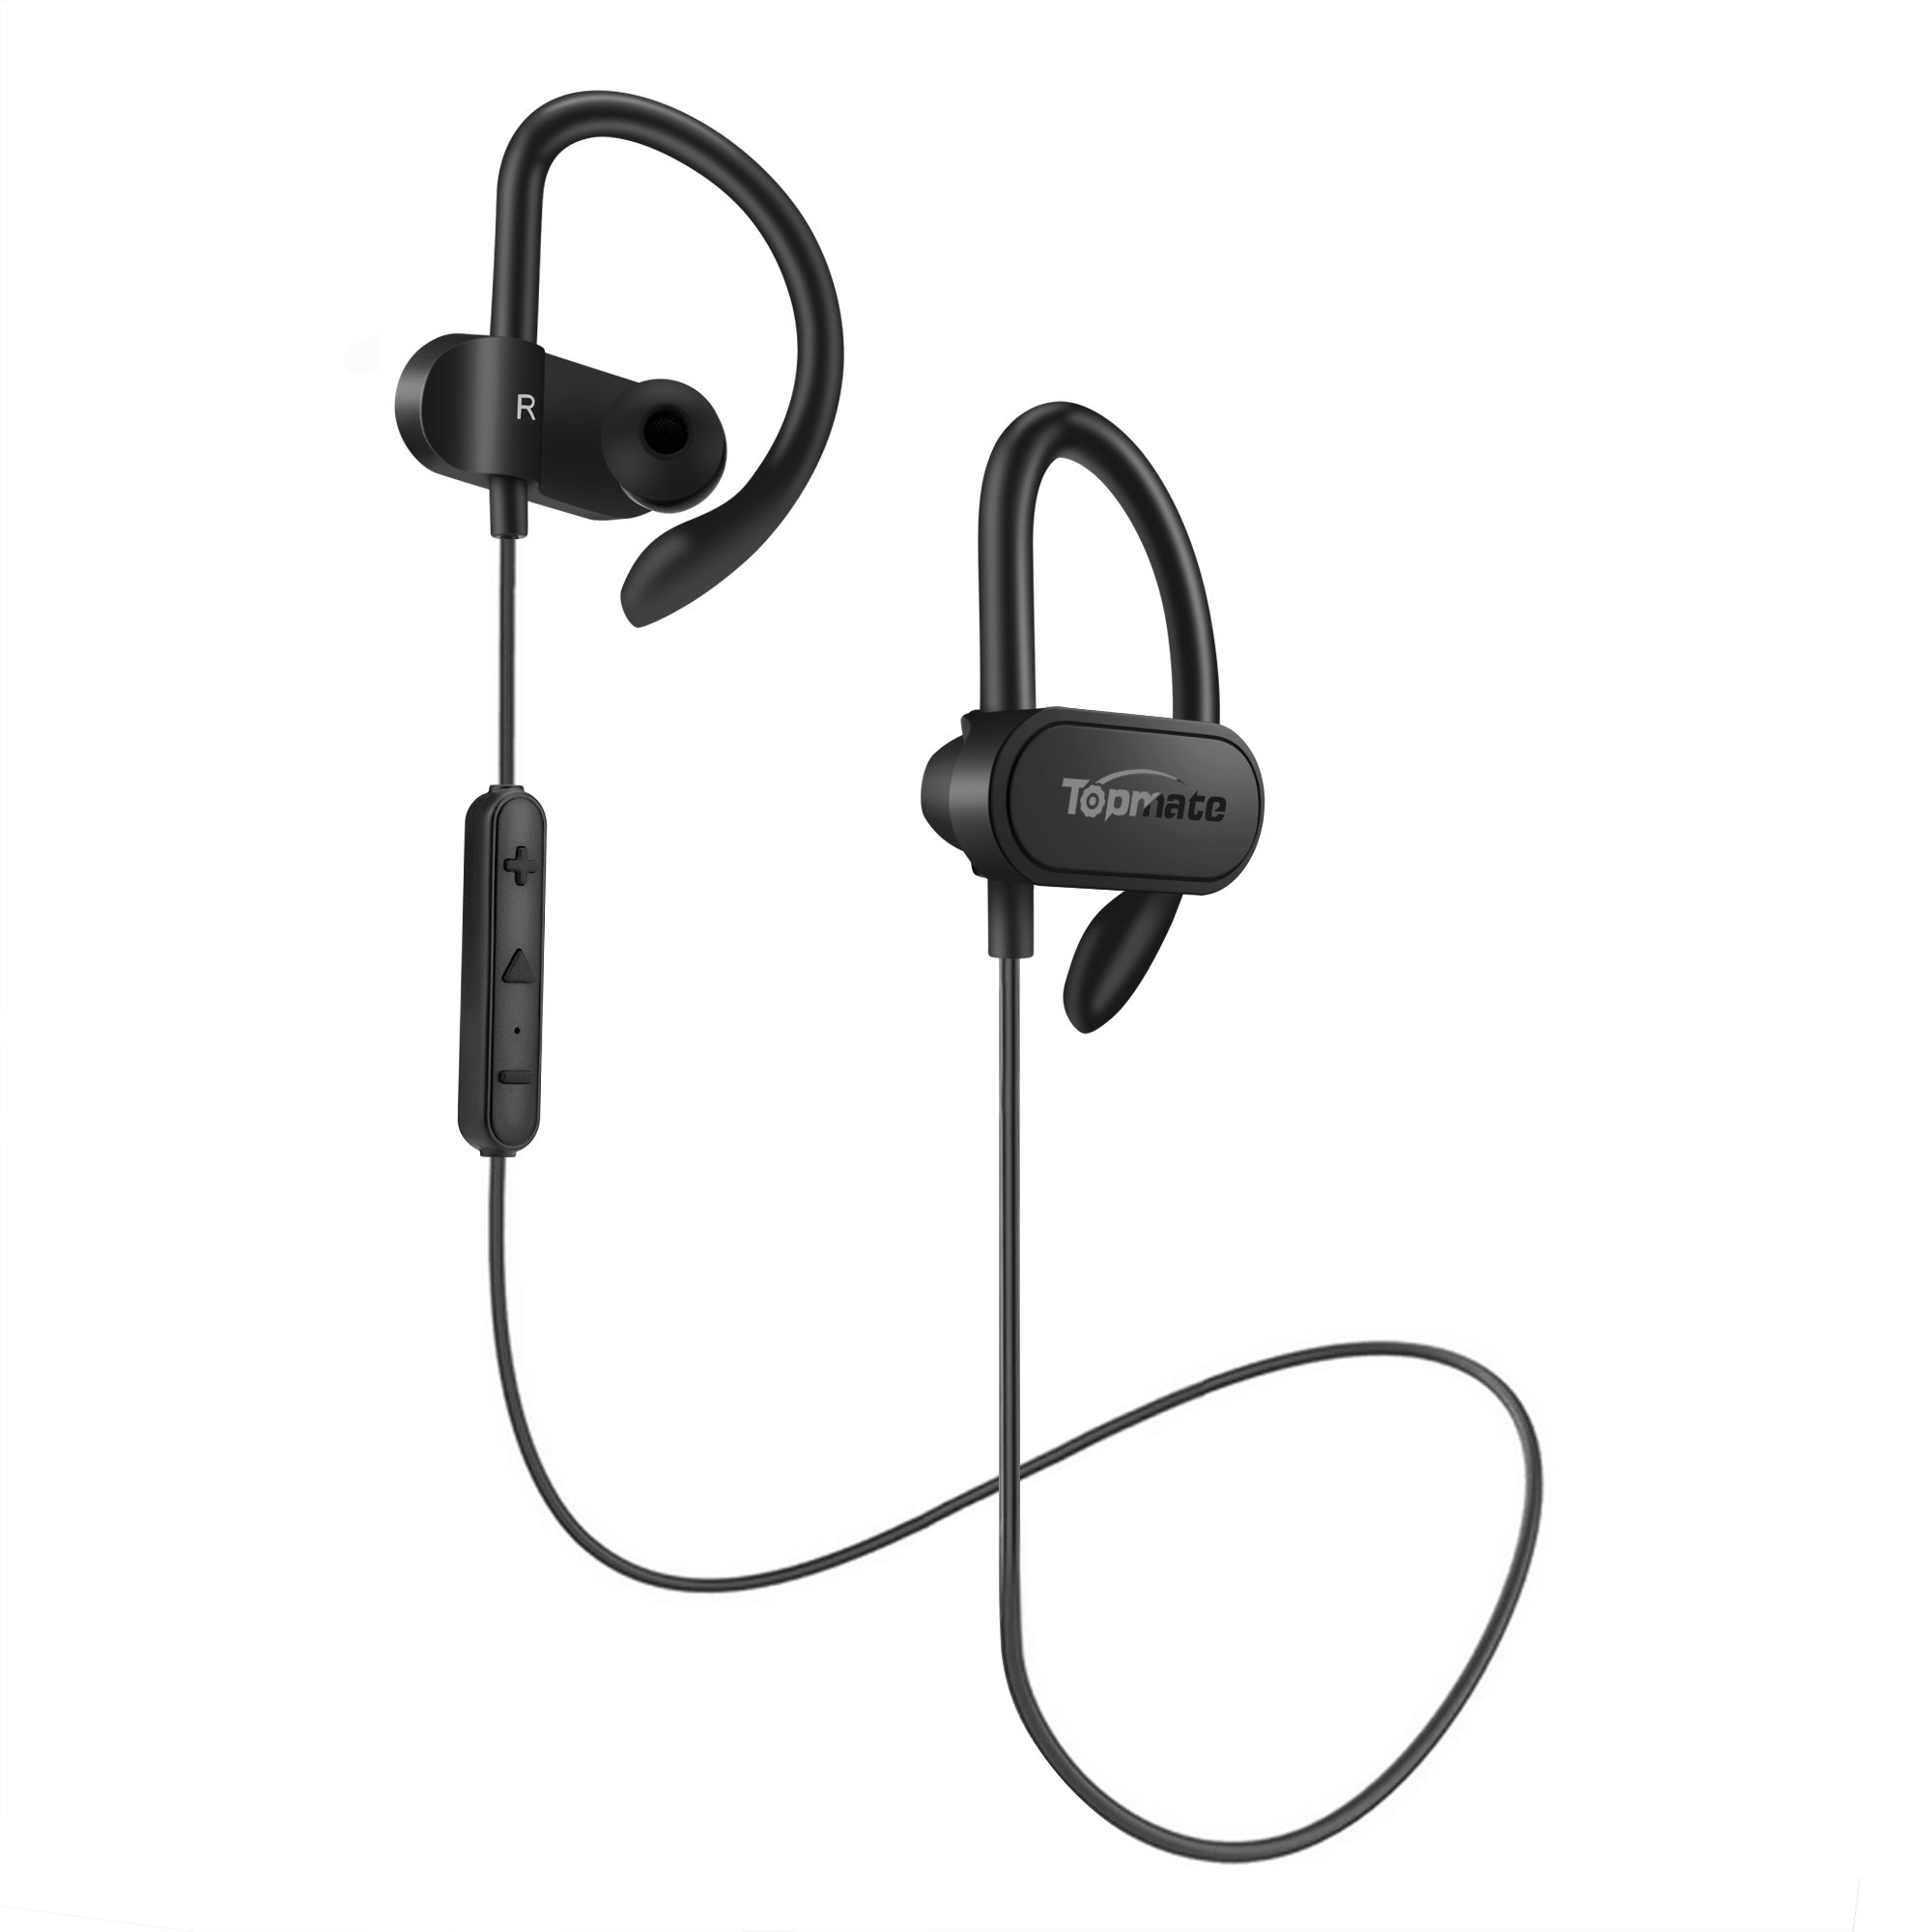 Amazon.com: Topmate Bluetooth Earphones Wireless Earbuds